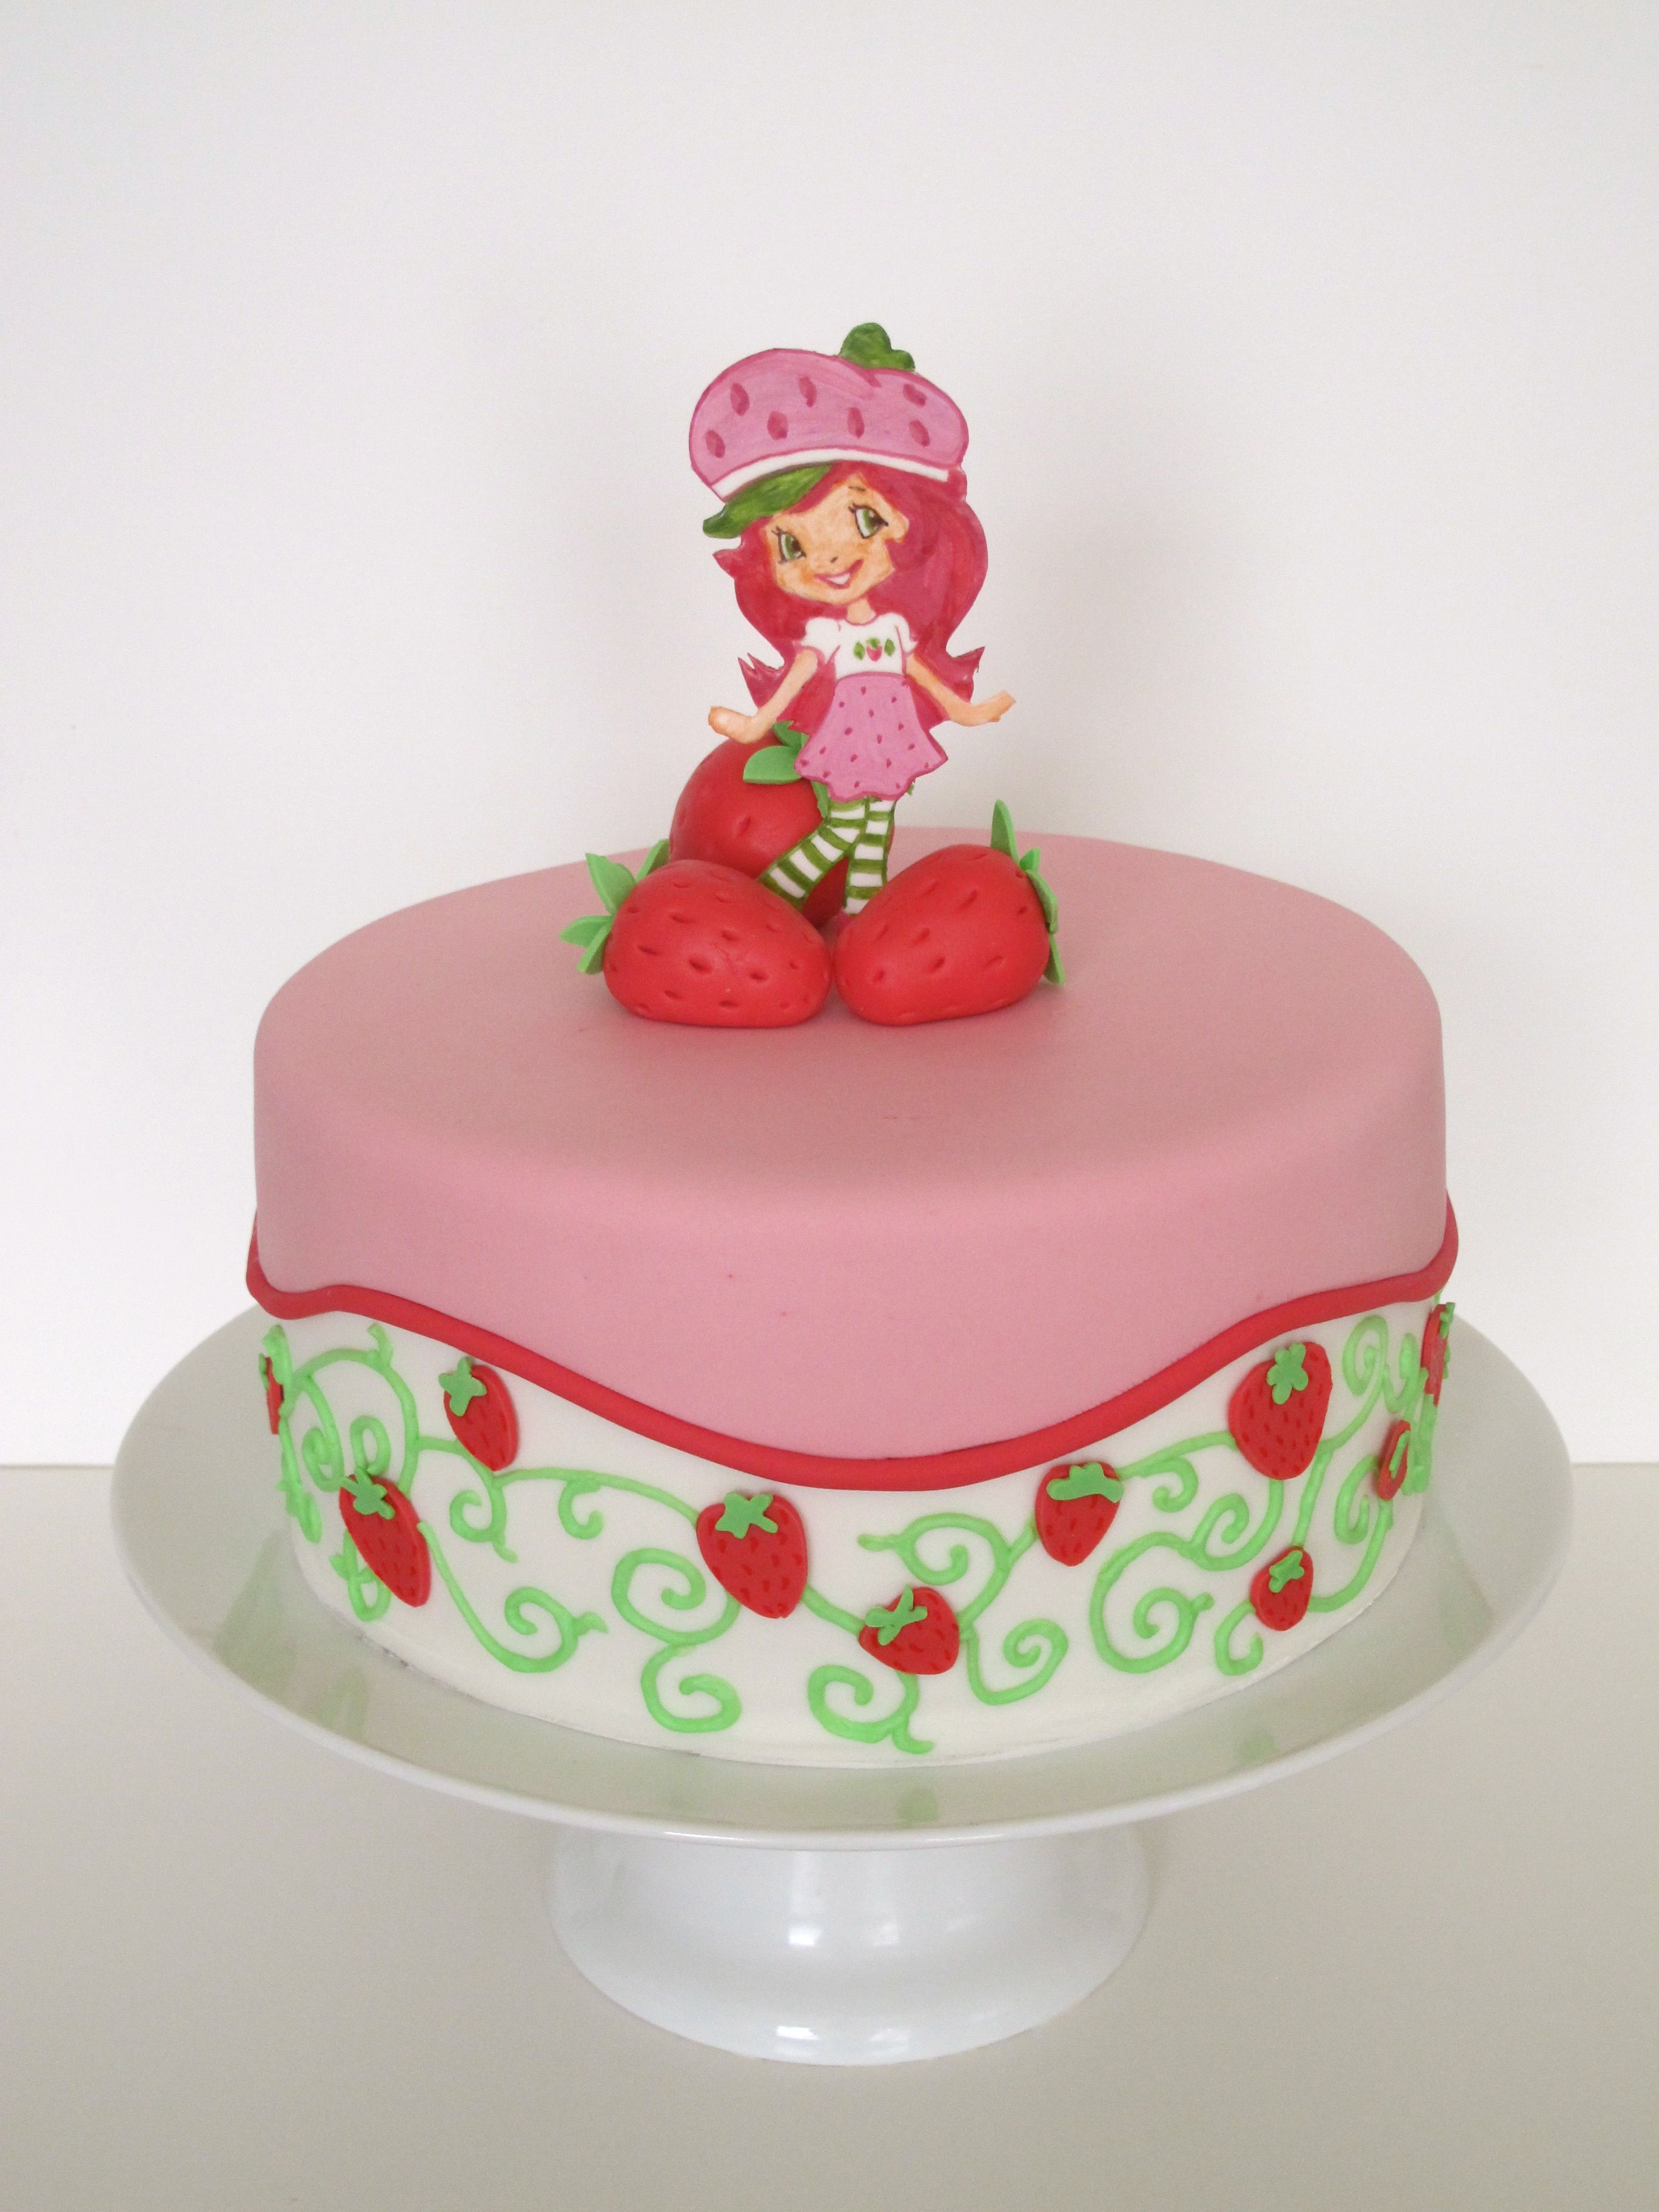 Terrific Strawberry Shortcake Cake With Images Strawberry Shortcake Personalised Birthday Cards Veneteletsinfo